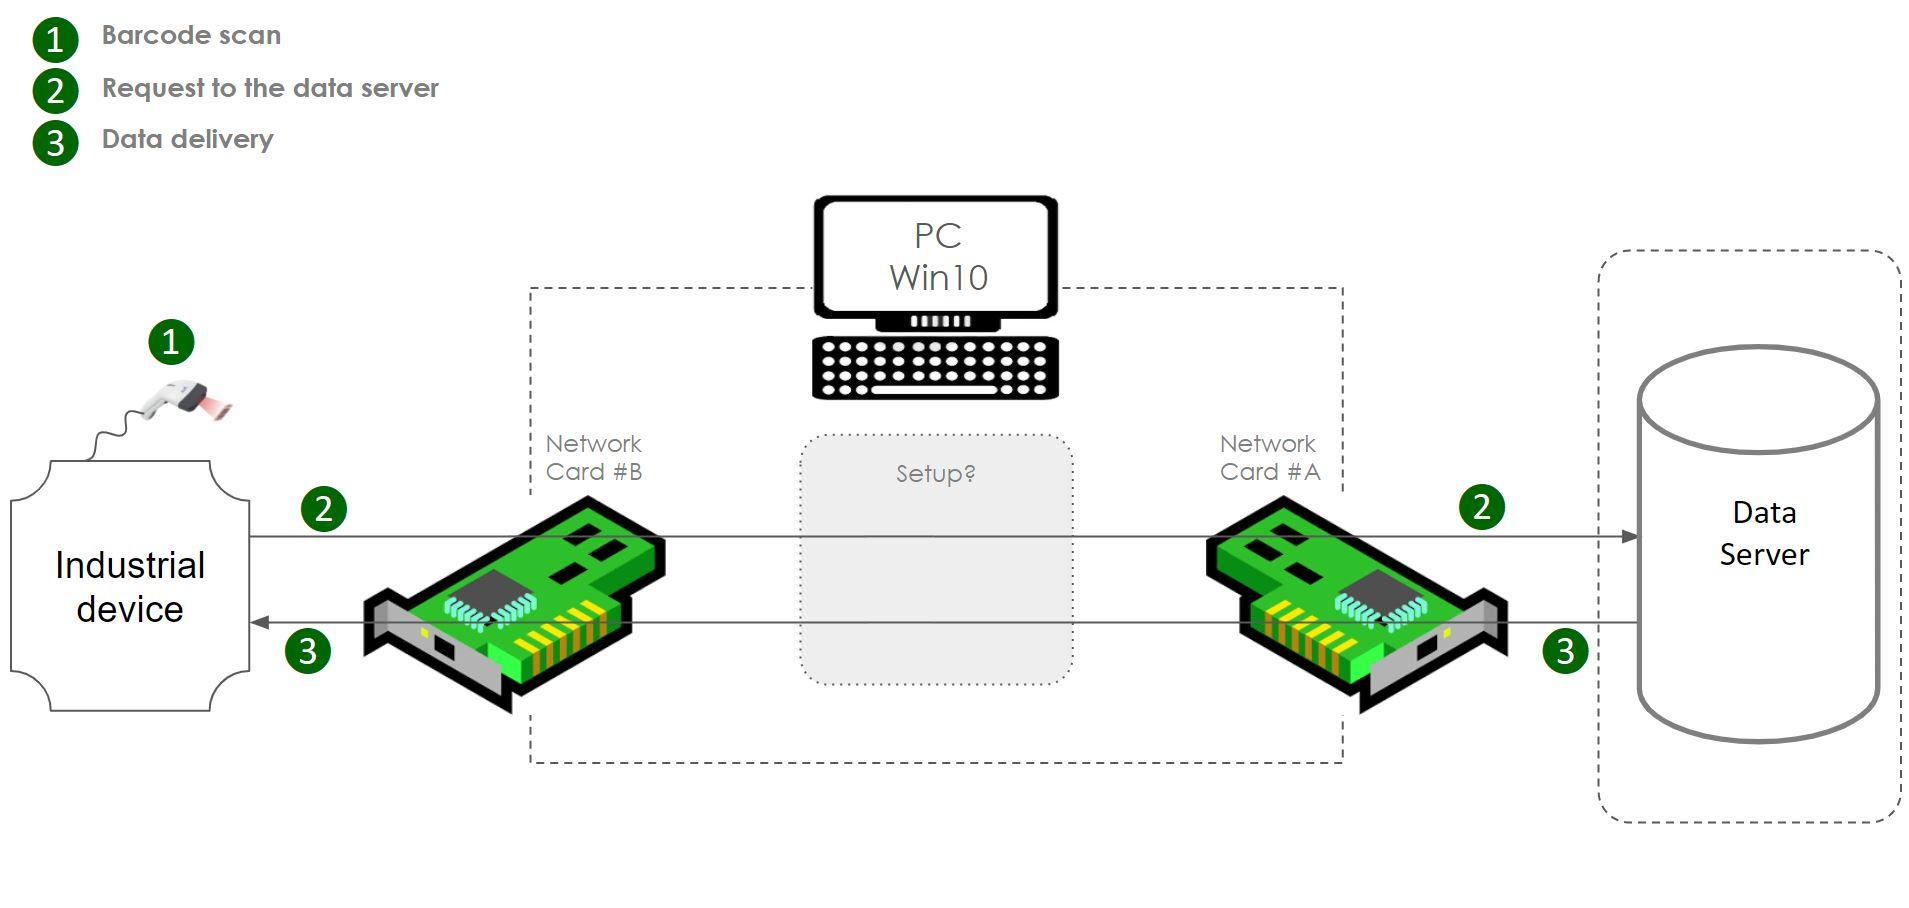 https://i.ibb.co/ZzXGJrG/2-Network-Card-com.jpg width=100